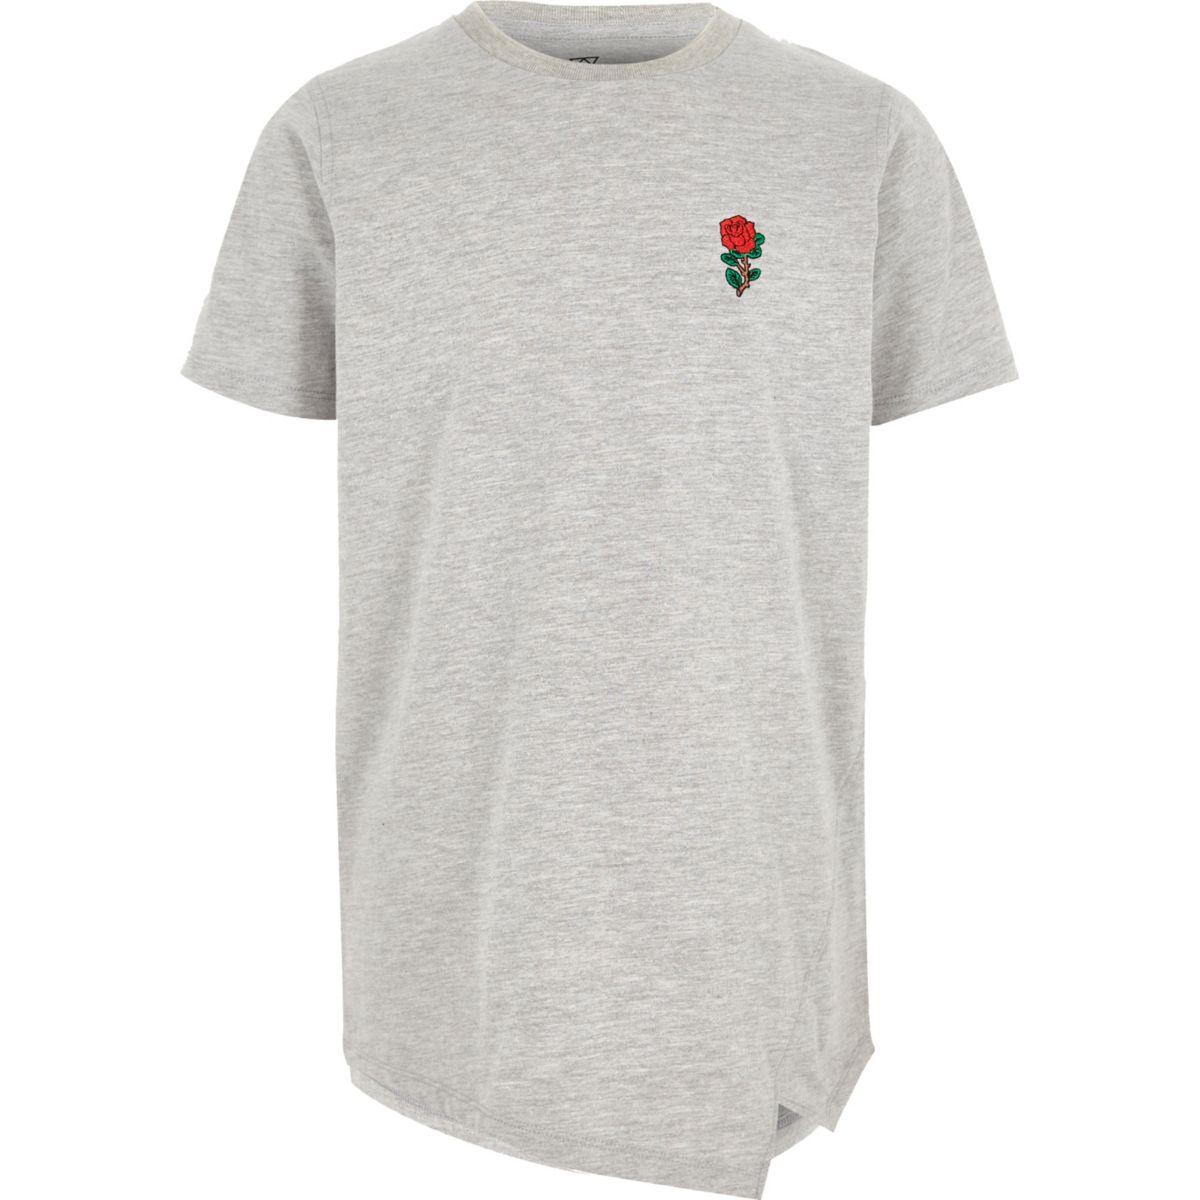 T-shirt gris chiné à rose brodée pour garçon